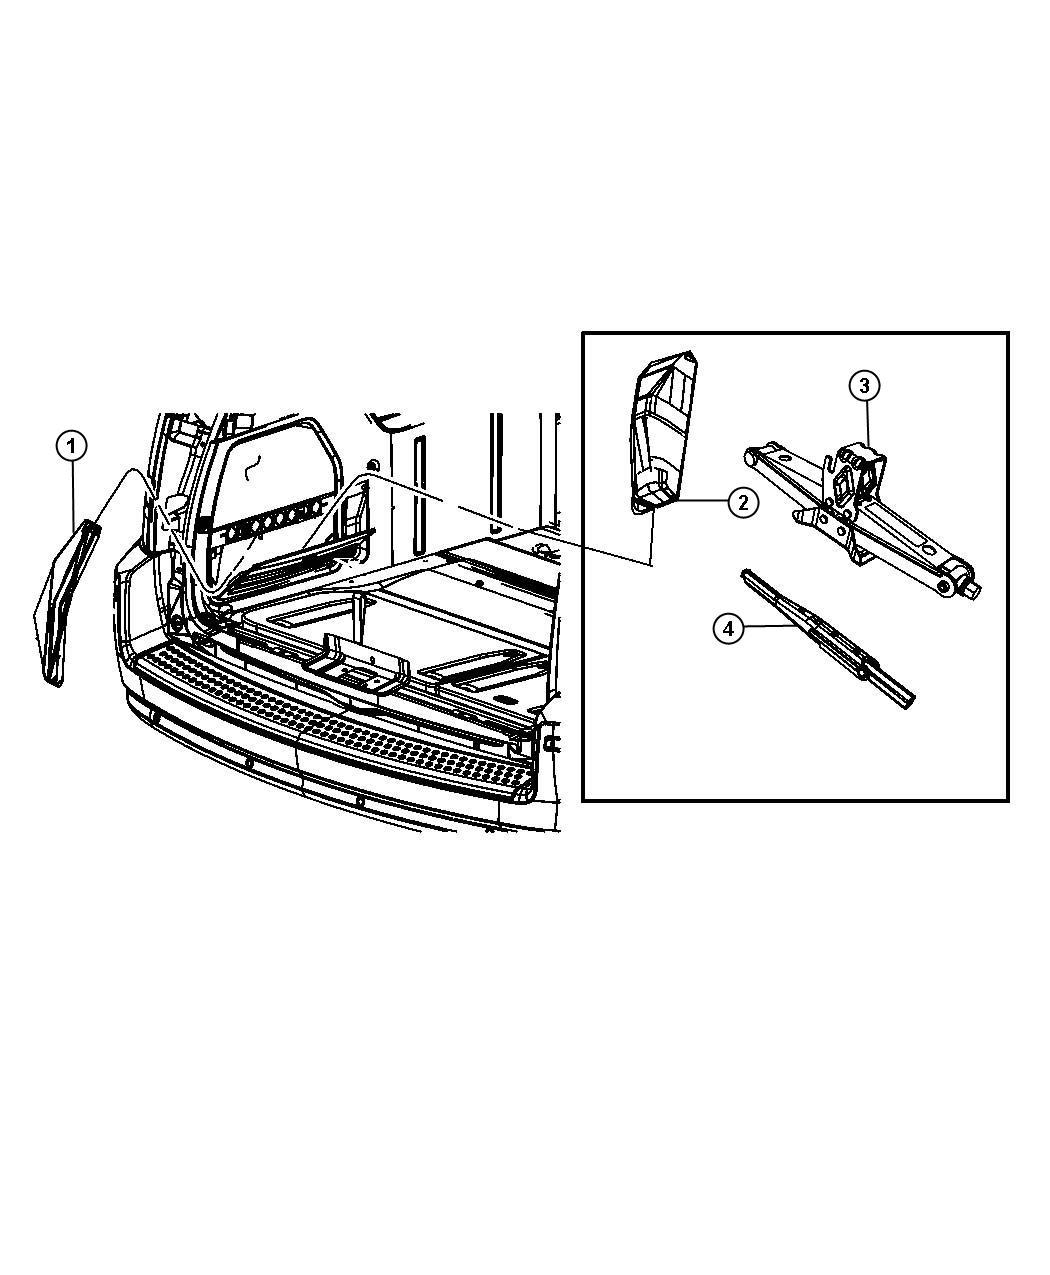 2008 Dodge Grand Caravan Jack  Scissors   Tbt  Or  Compact